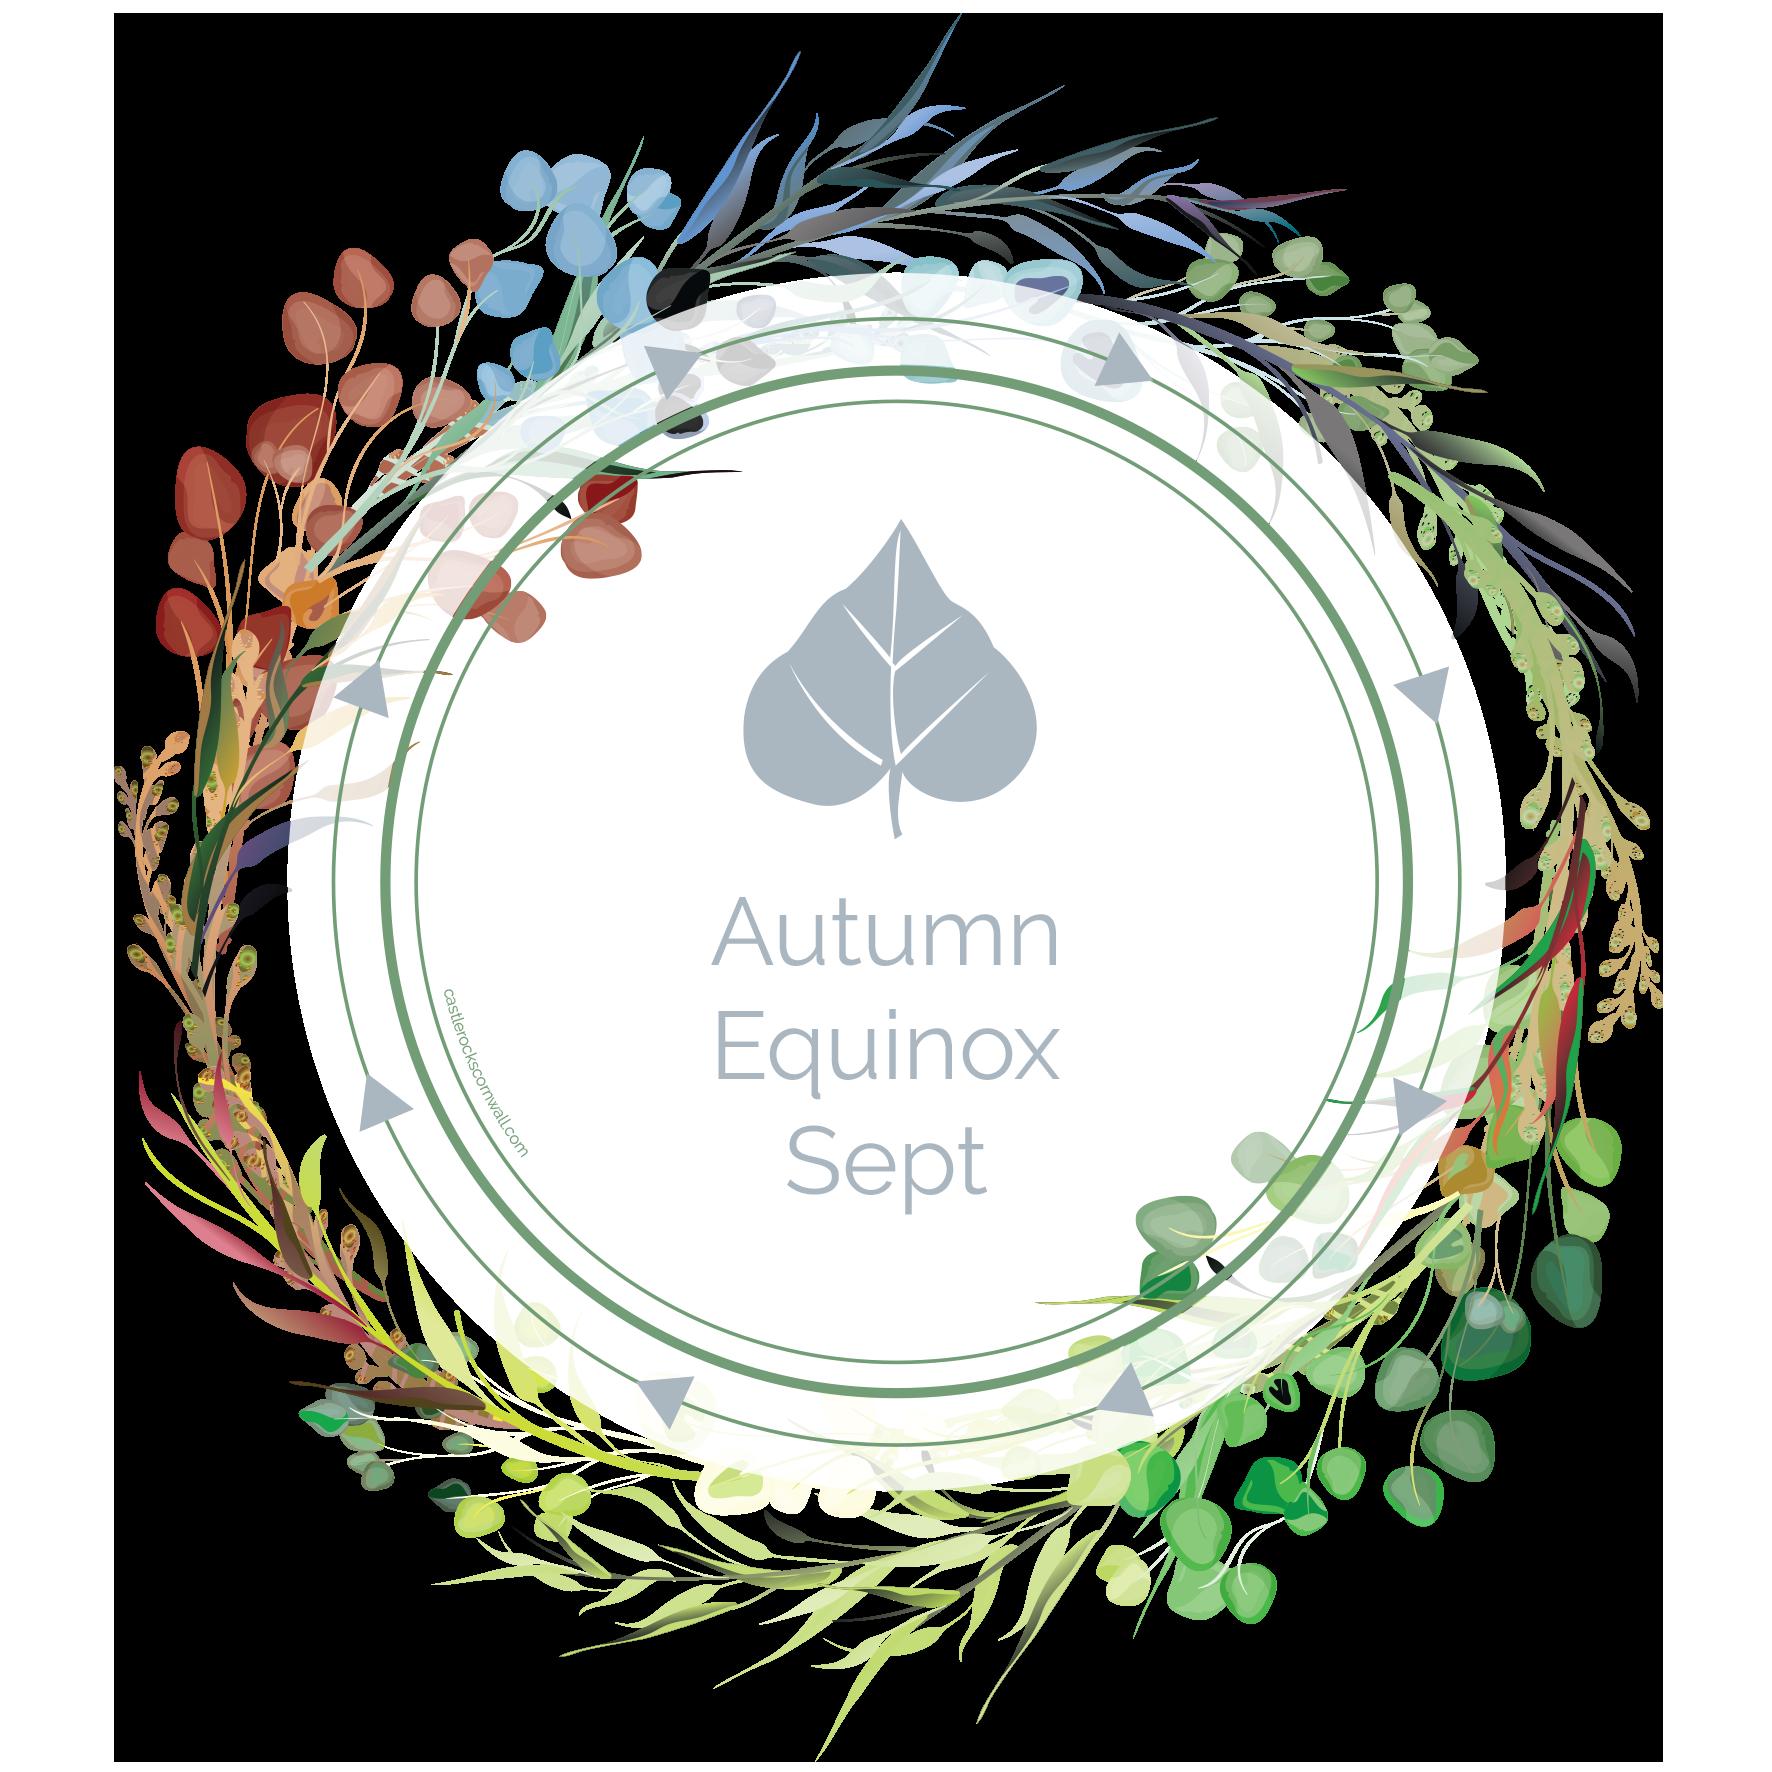 Autumn Equinox Fall